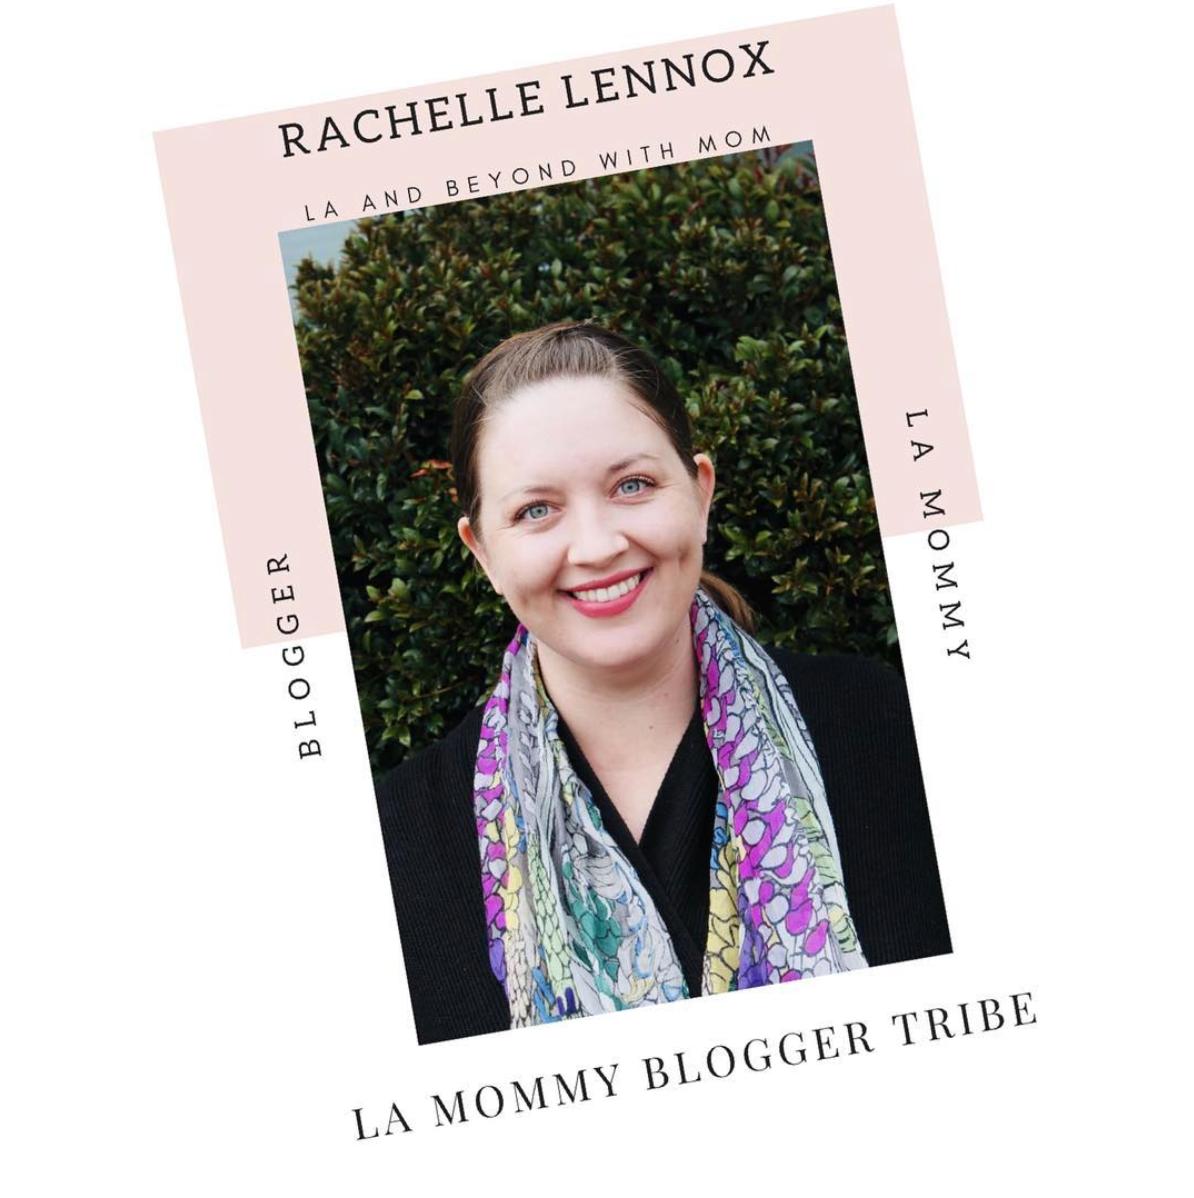 Rachelle Lennox